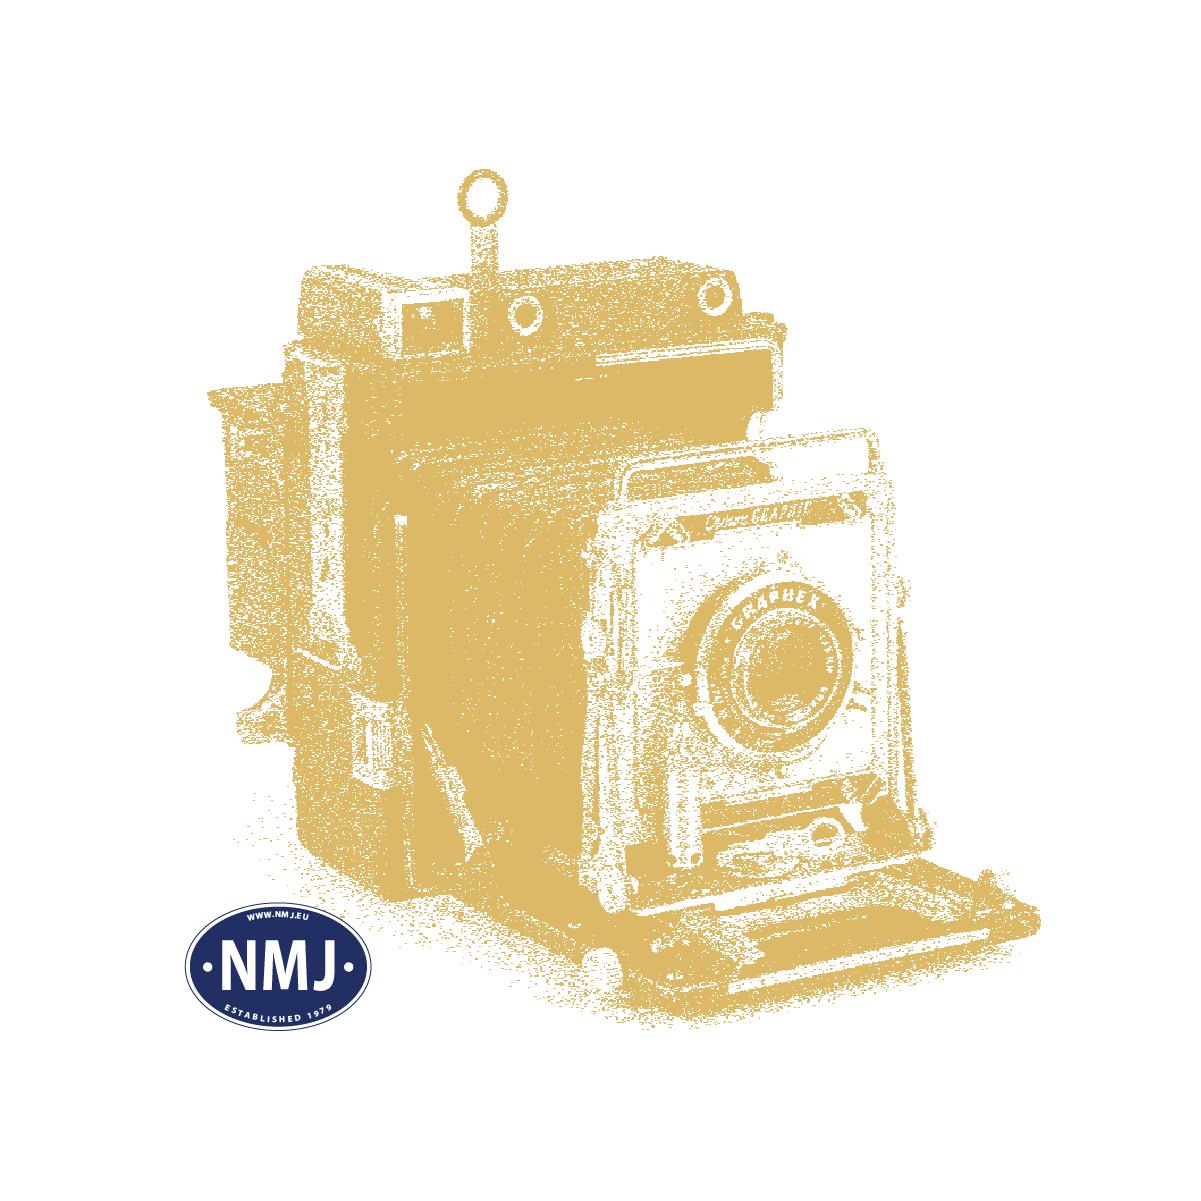 NMJT1042.01 - NMJ Topline NSB AB11K 24120 Intermediate design